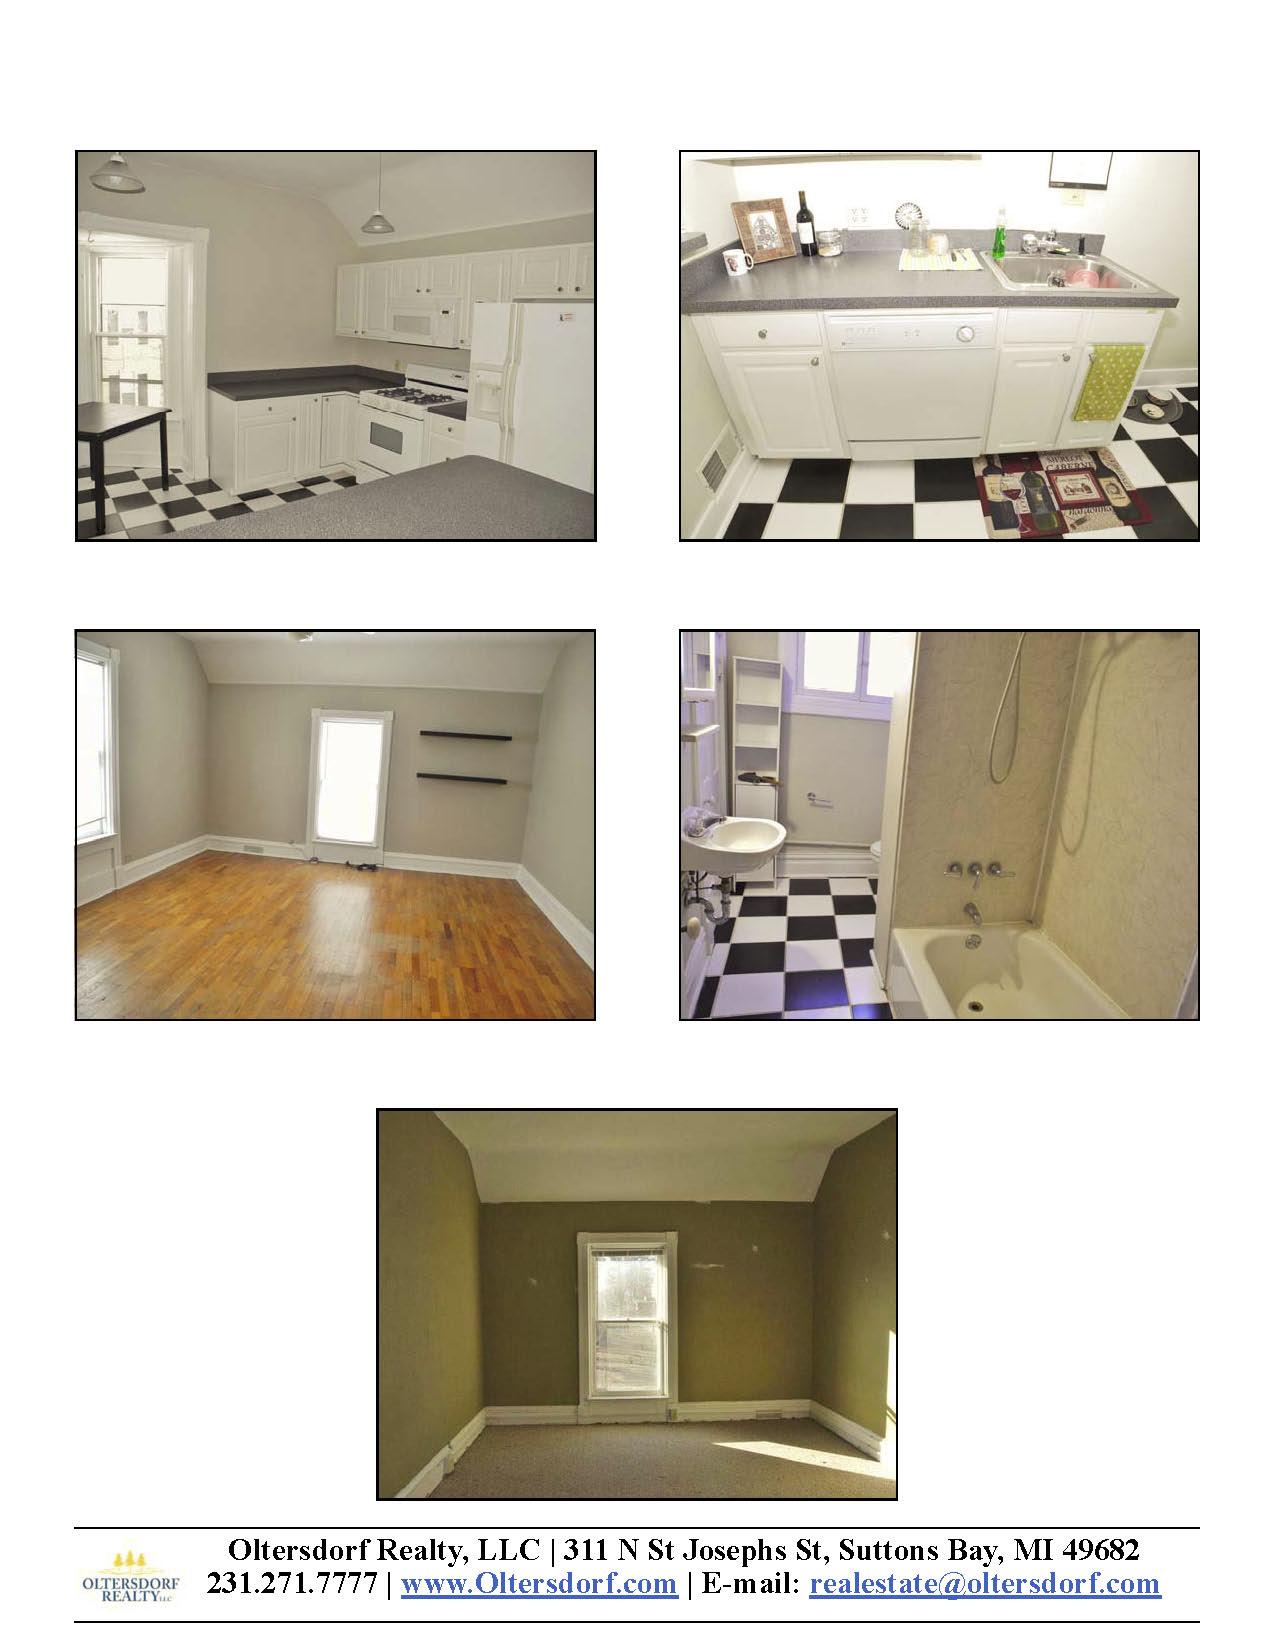 224 W Eighth St, Traverse City, MI – Downtown Traverse City Triplex Marketing Packet - For sale by Oltersdorf Realty LLC (5).jpg